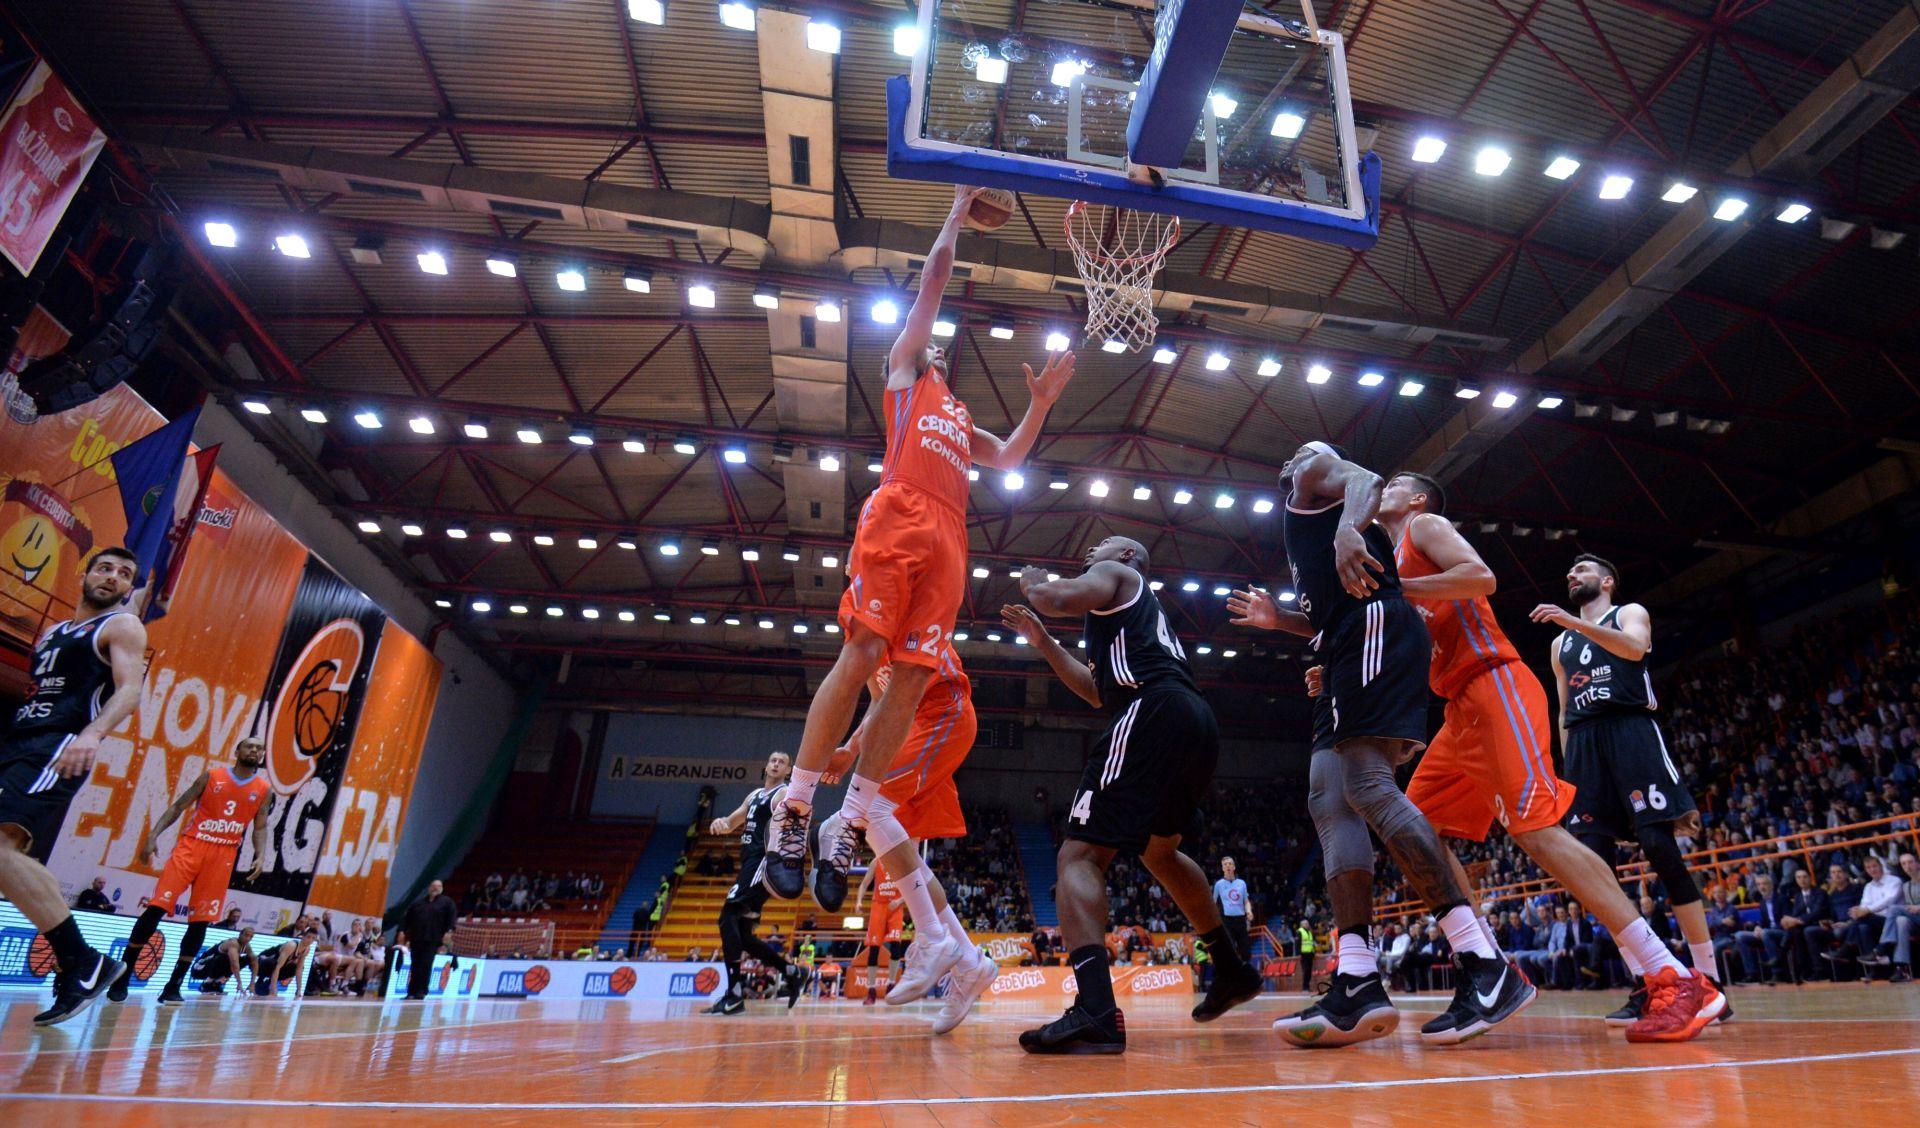 ABA LIGA Cedevita povela protiv Partizana u polufinalu doigravanja